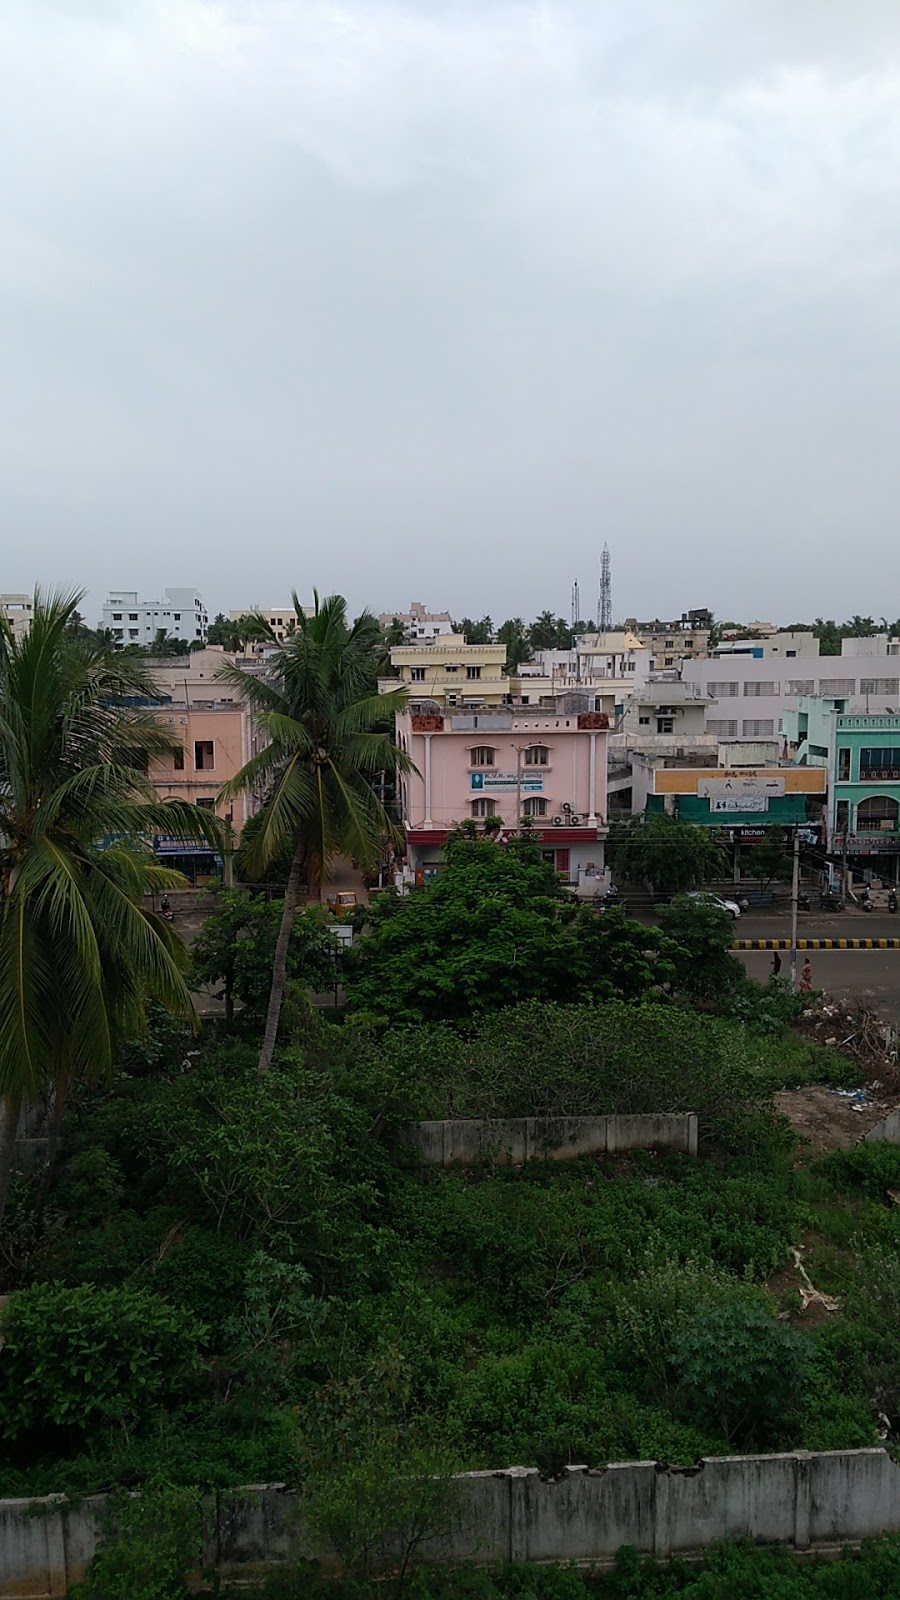 blood bank Axis Bank near Rajahmundry Andhra Pradesh